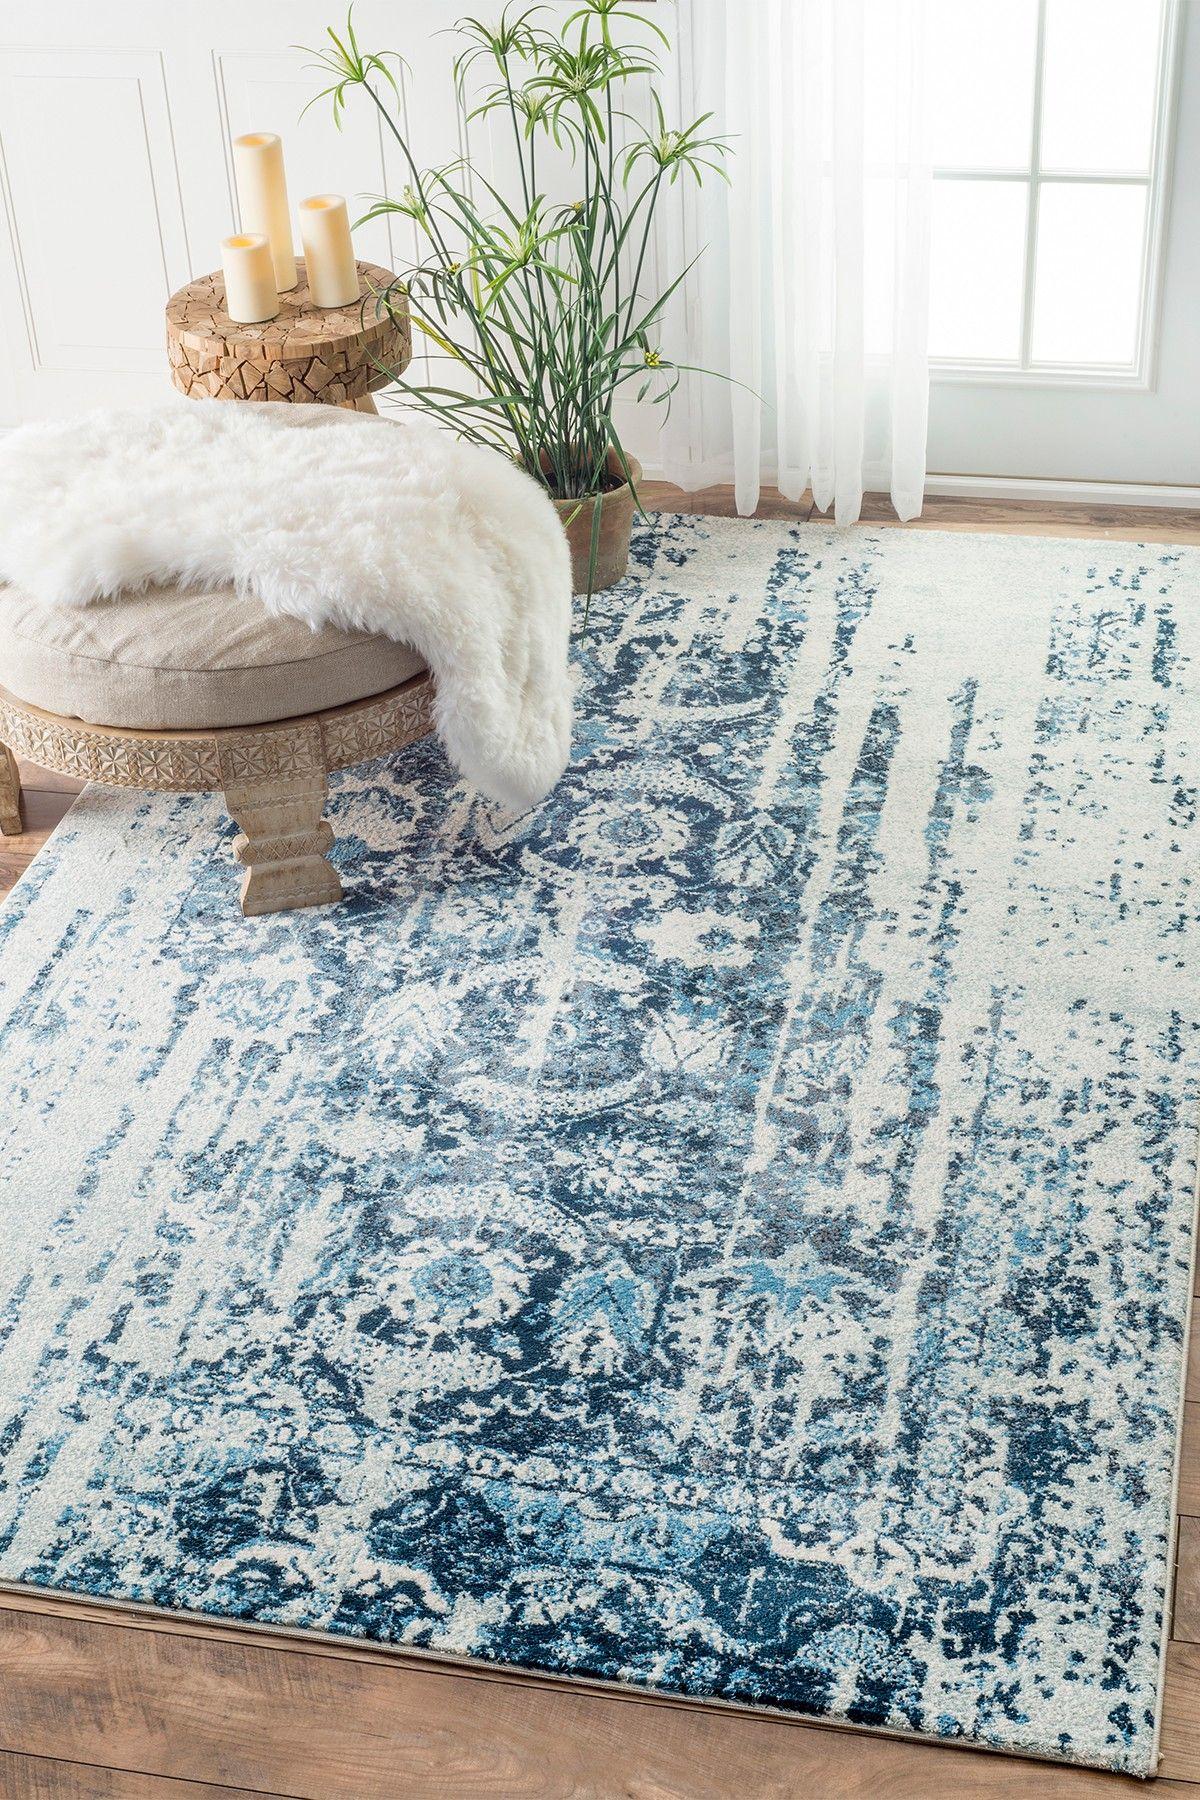 Need this nuLOOM Blue Distressed Ernestina Flourish rug | Home ...